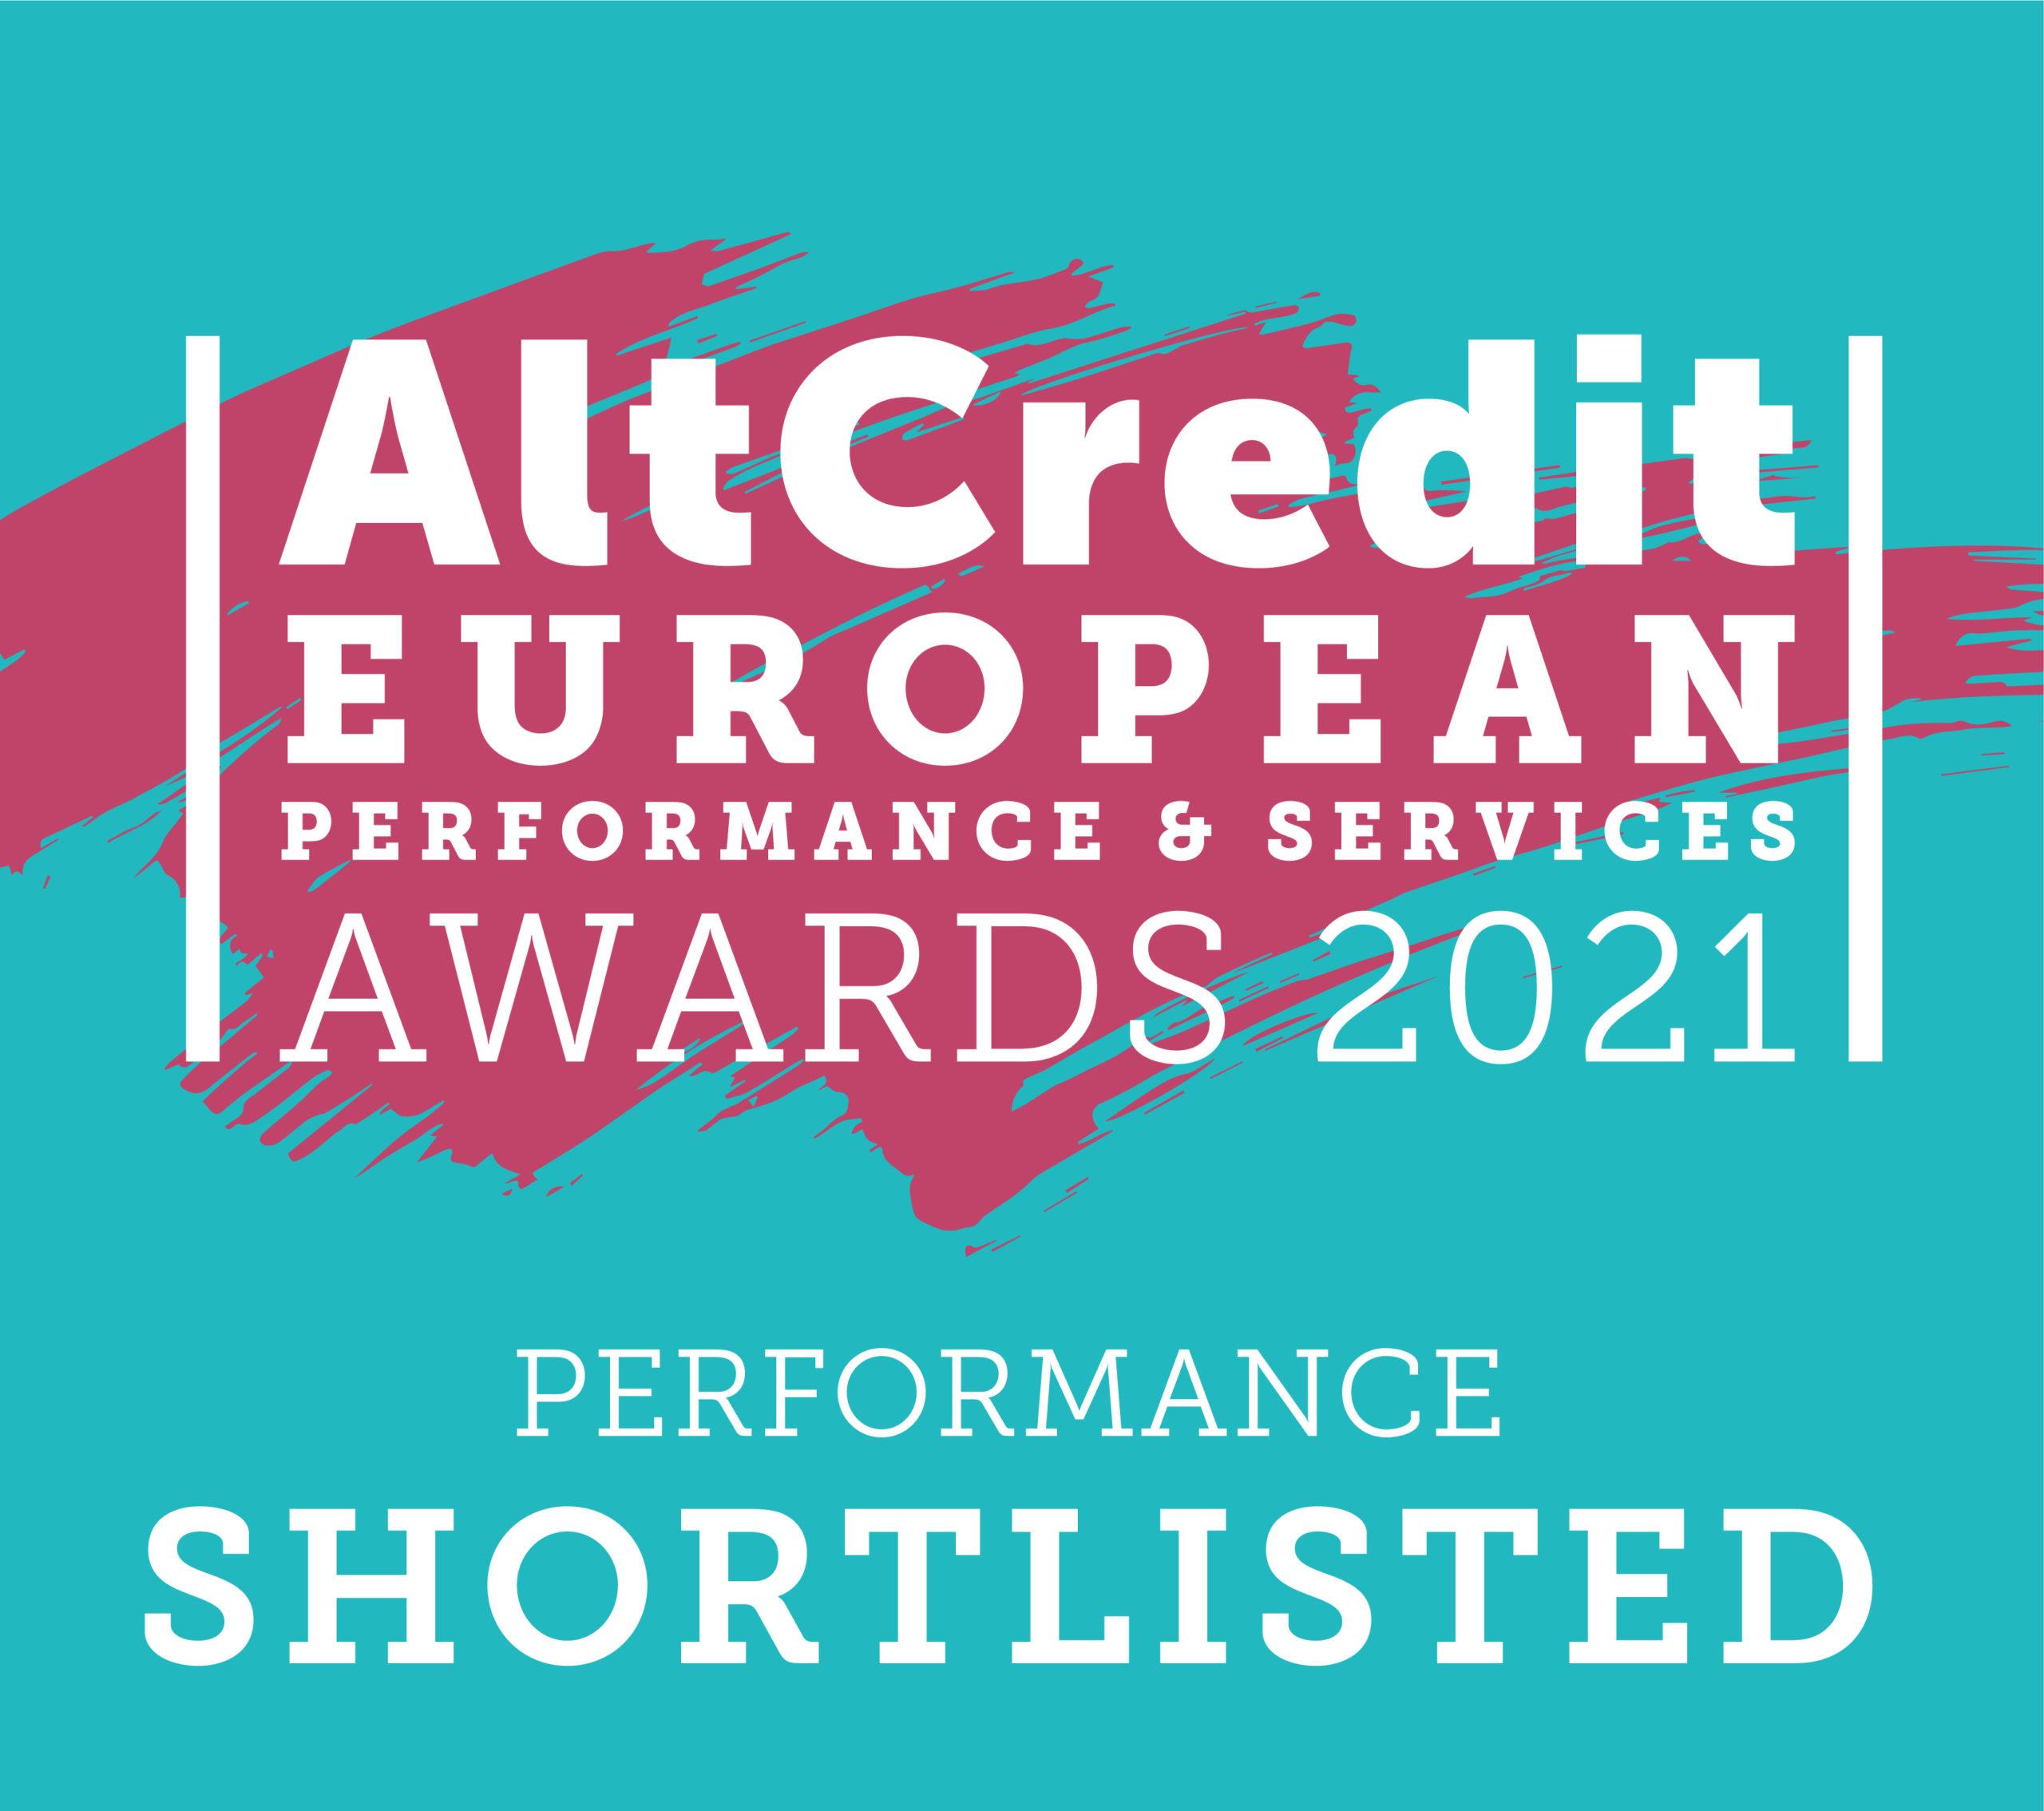 ACFI 2021 European Awards_PerformanceLogos_Shortlisted_Pt